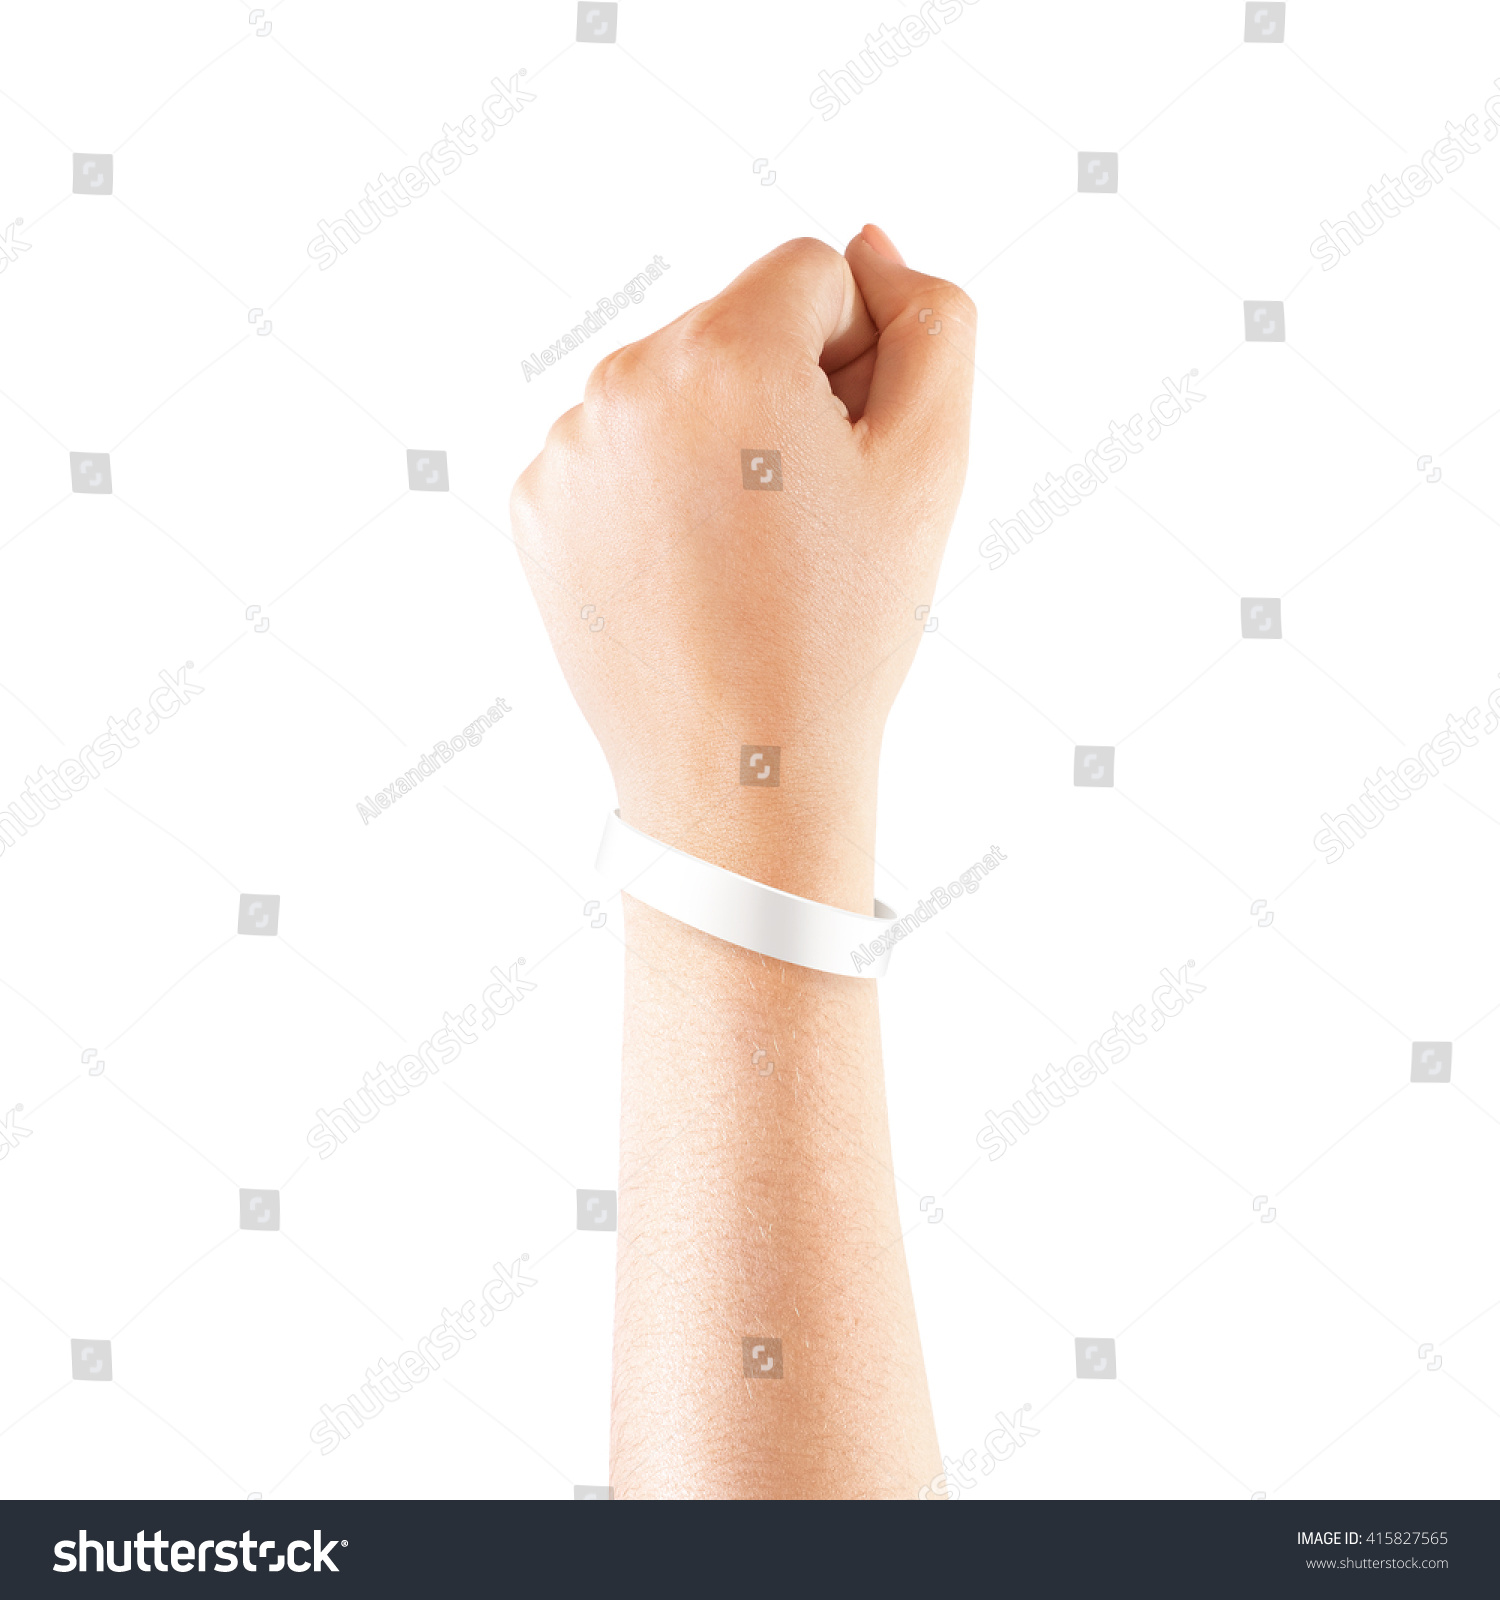 Blank White Rubber Wristband Mockup On Stock Photo ...